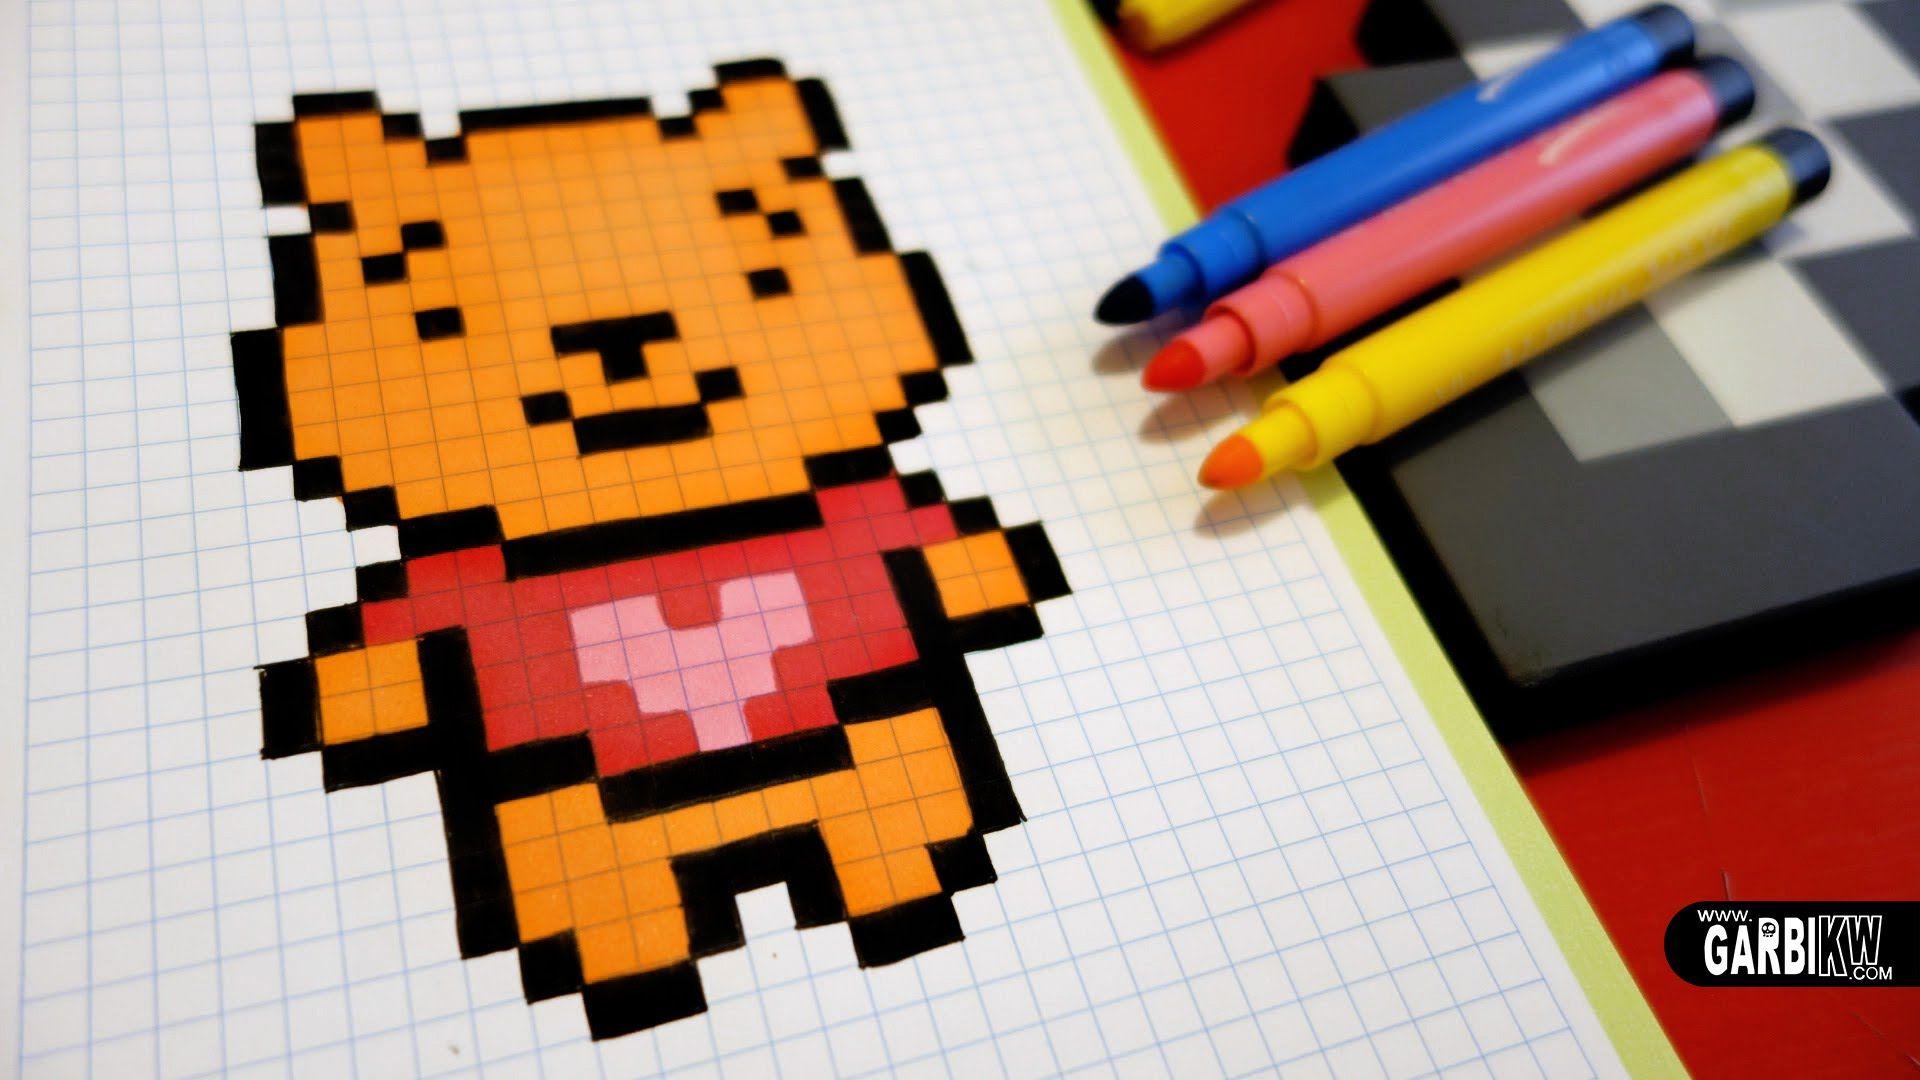 Handmade Pixel Art How To Draw Winnie The Pooh Pixelart Avec